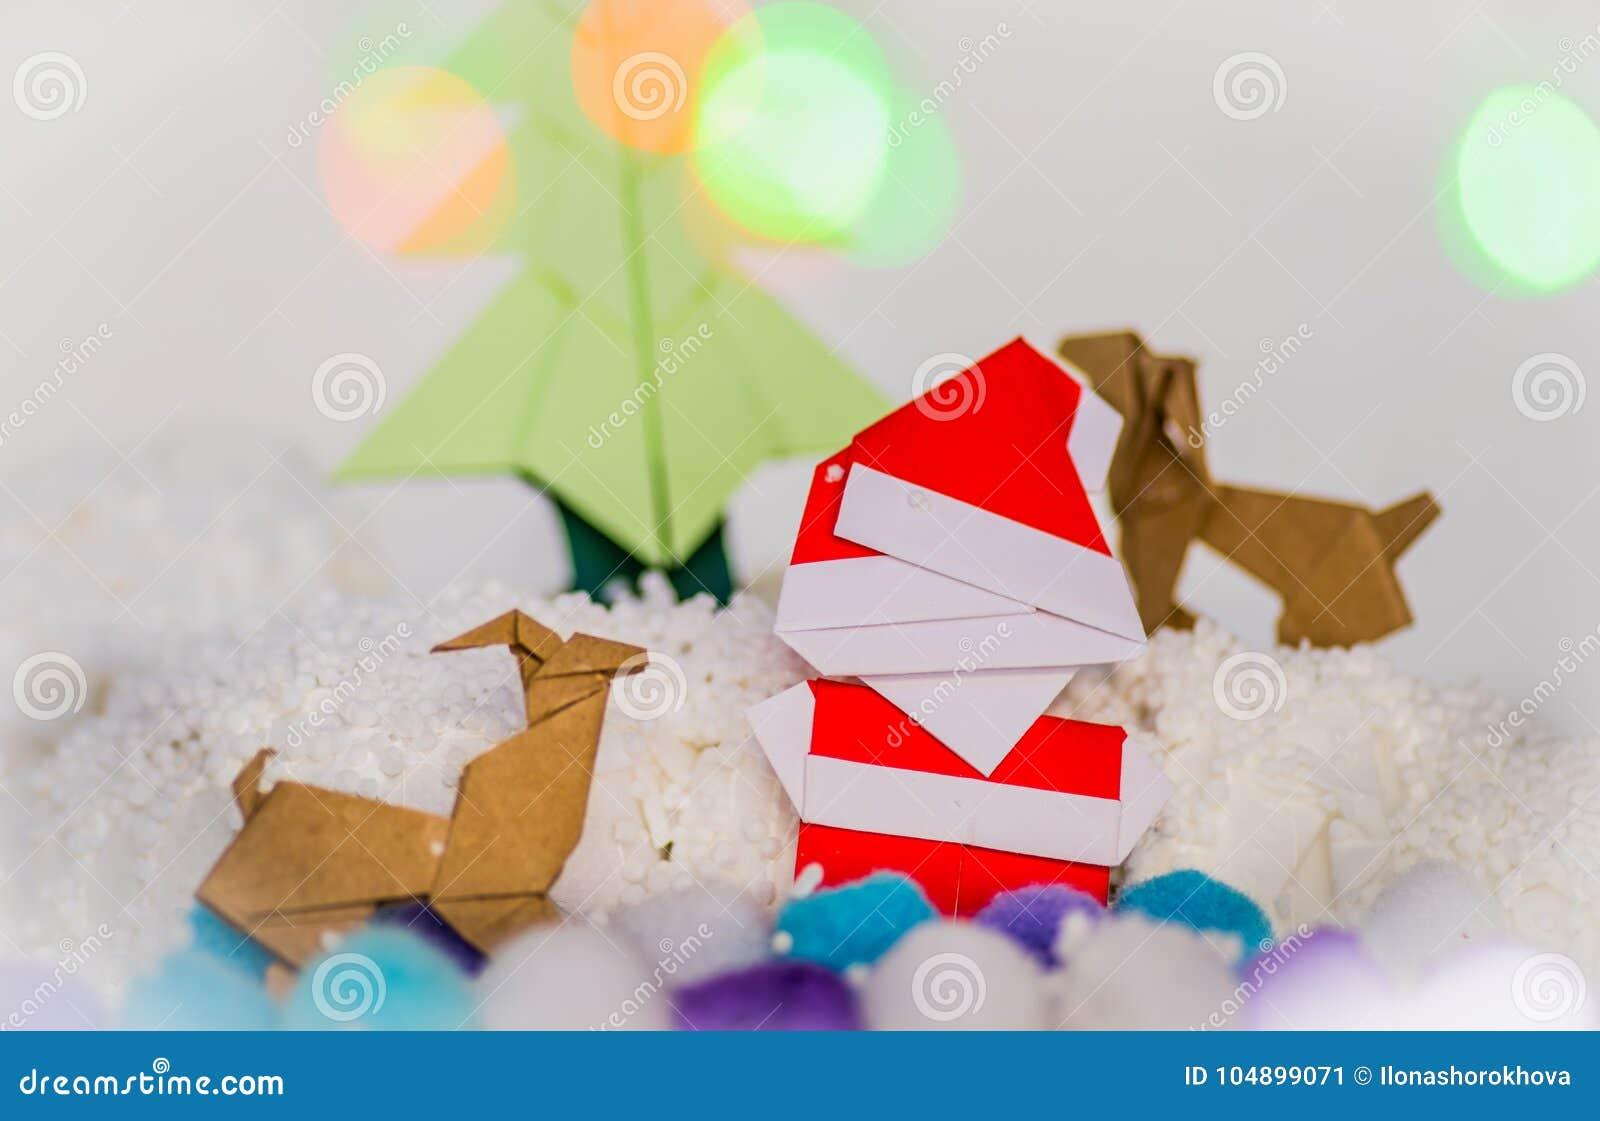 Santa Clausxmas Tree And Reindeers Christmas Paper Craft Stock